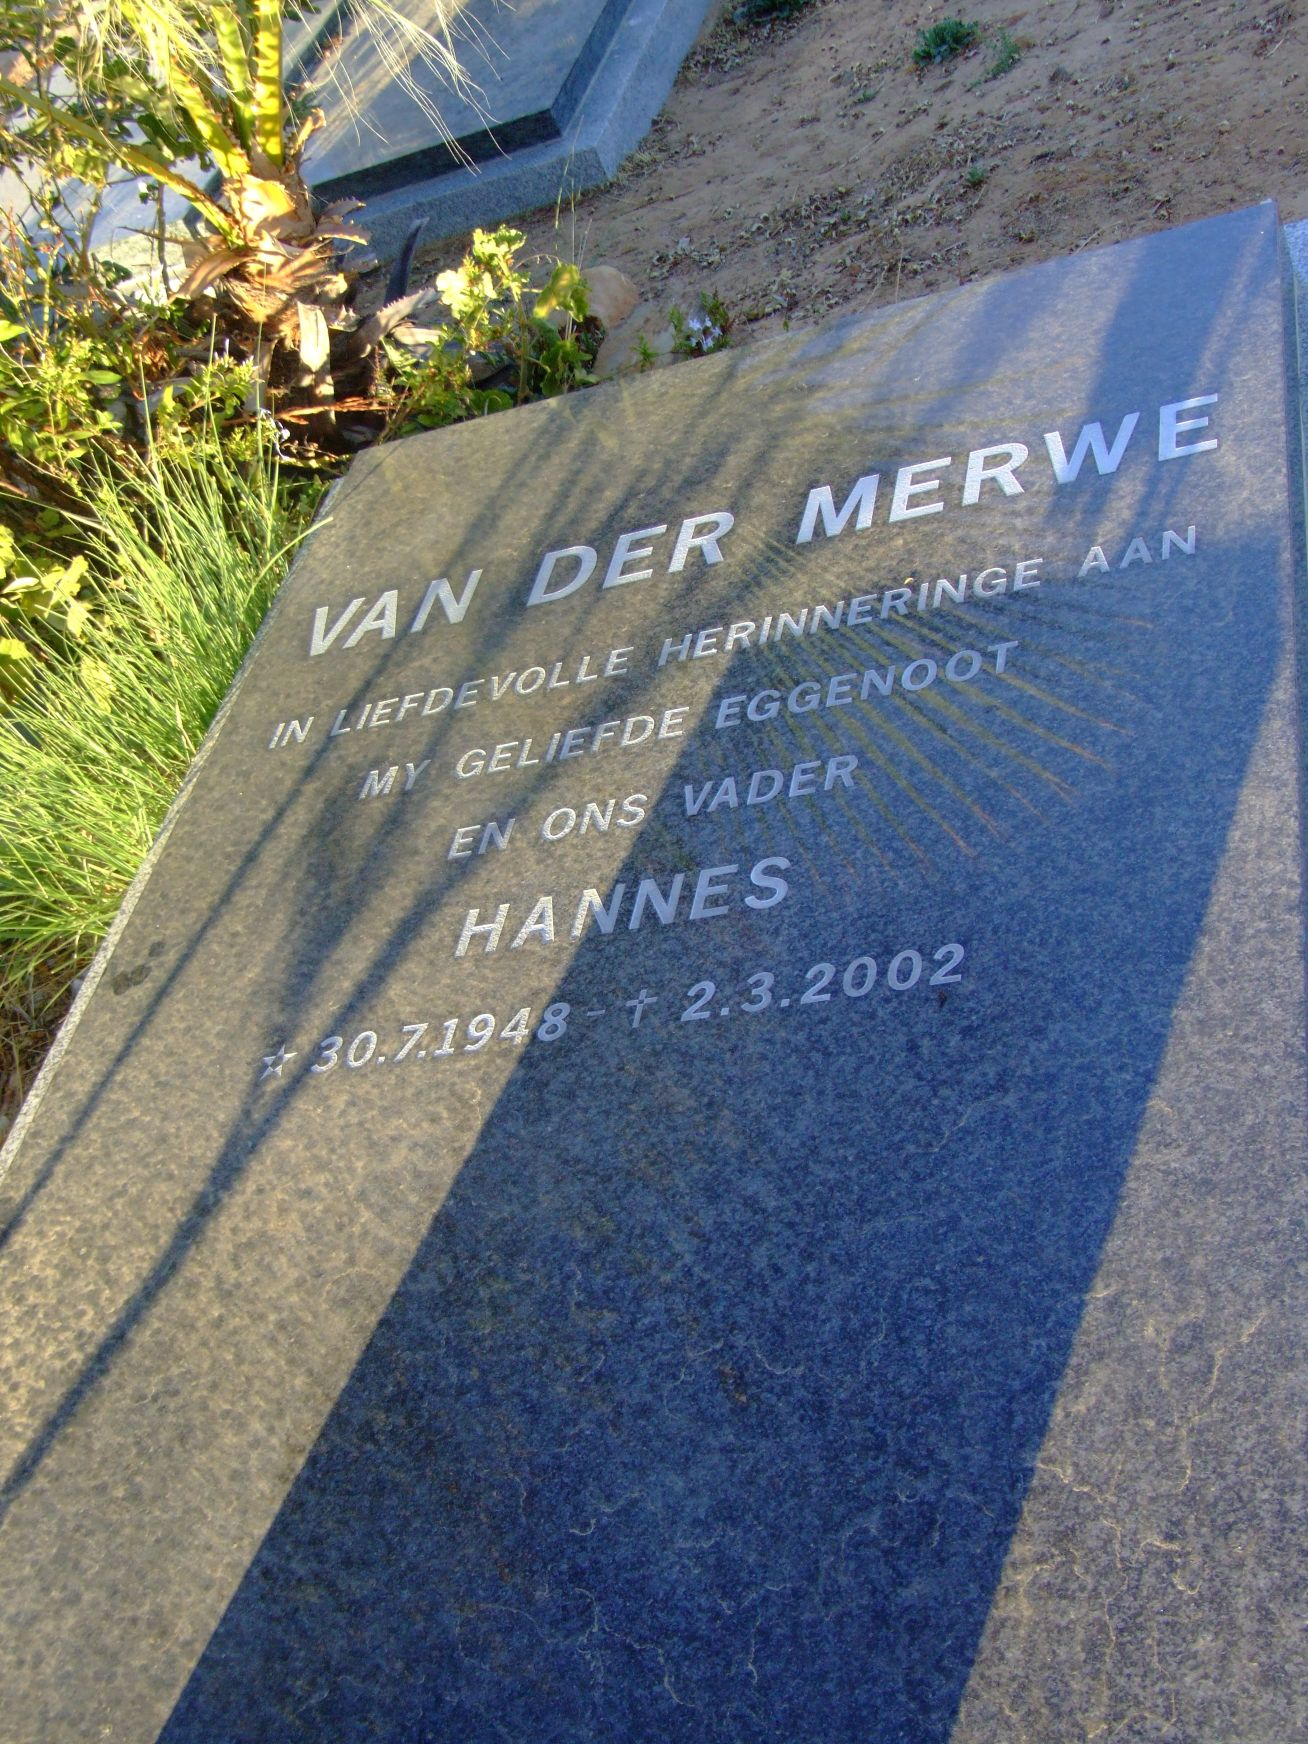 van der Merwe, Hannes